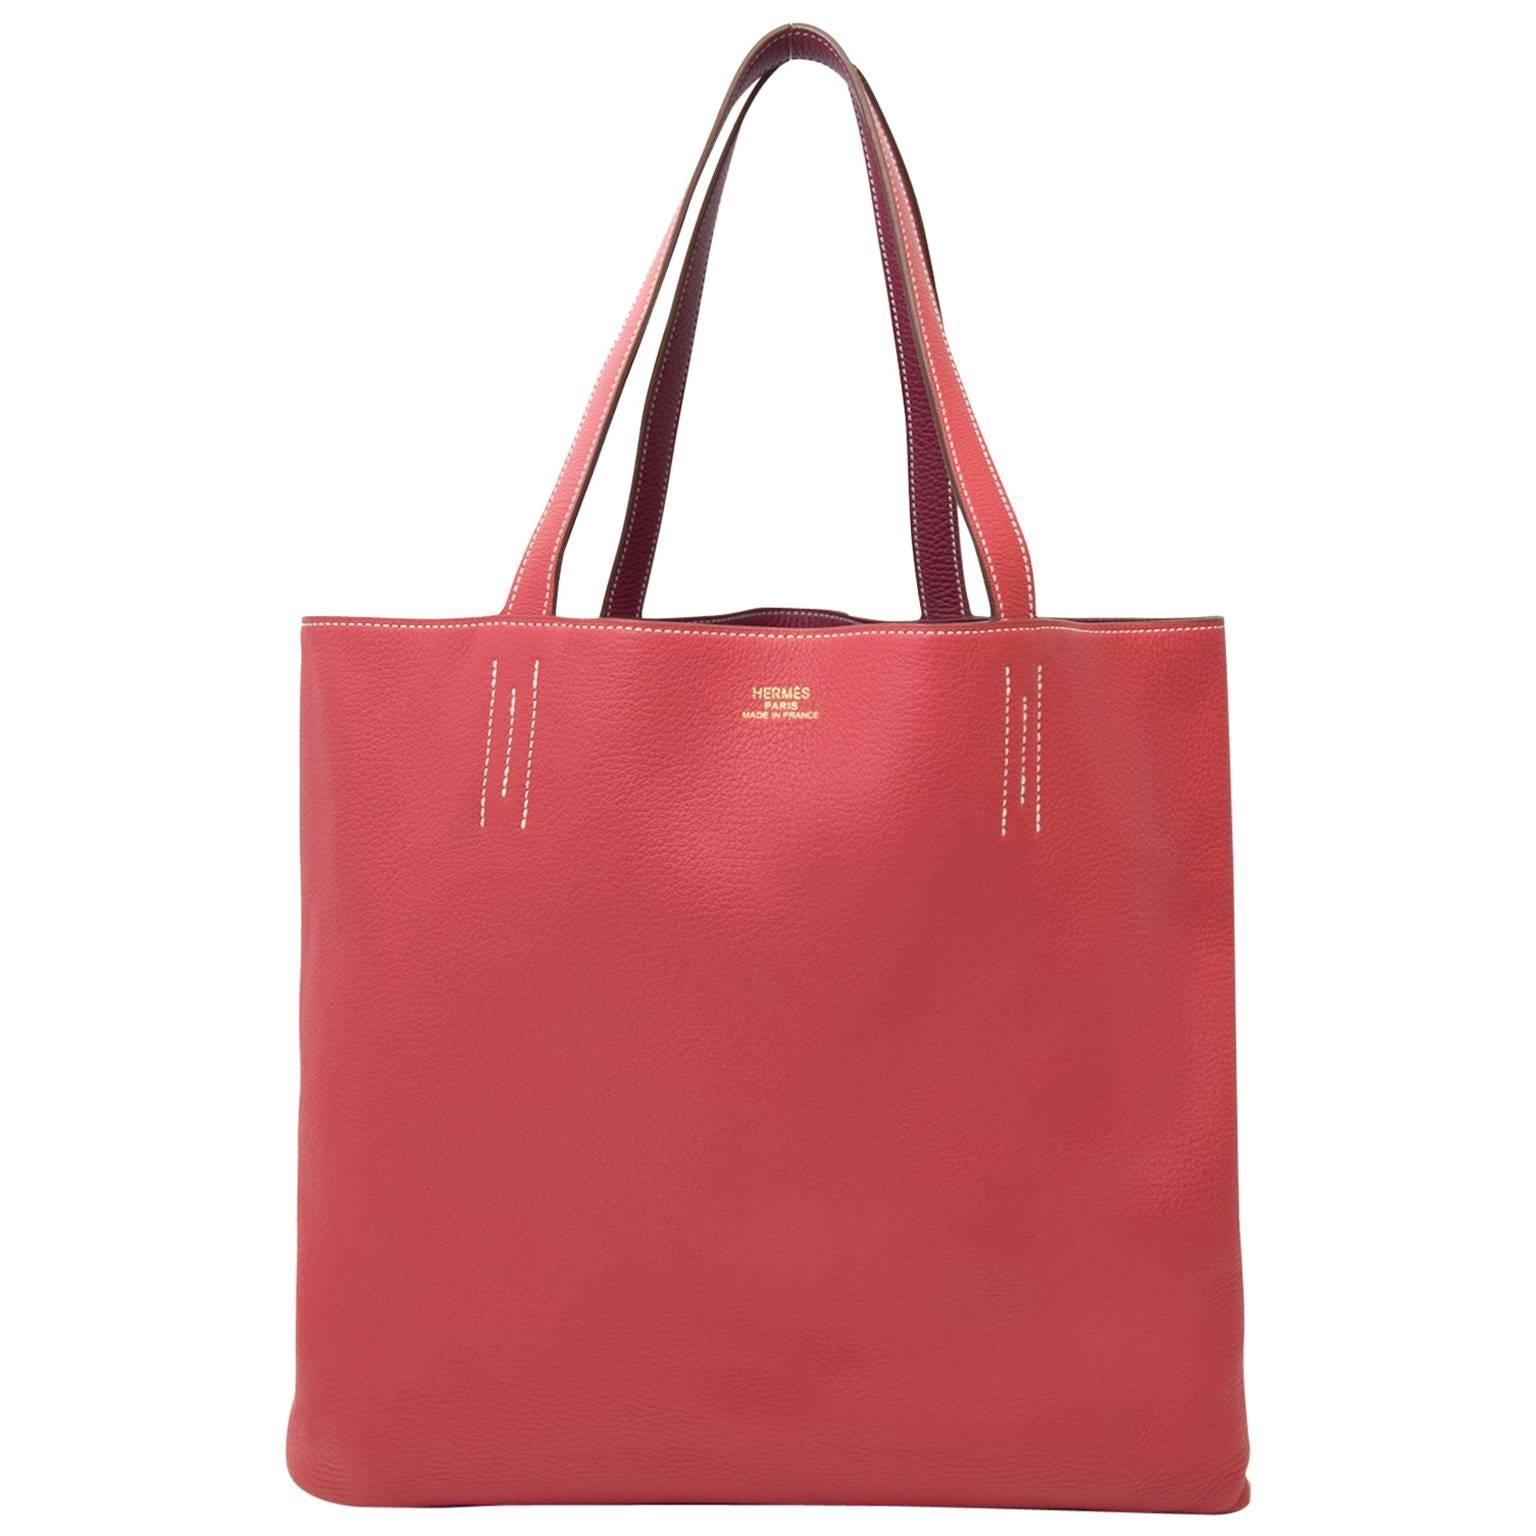 2a3ed18d4482 Hermès Birkin 35 cm Candy Veau Epsom Rose Tyrien + receipt at 1stdibs